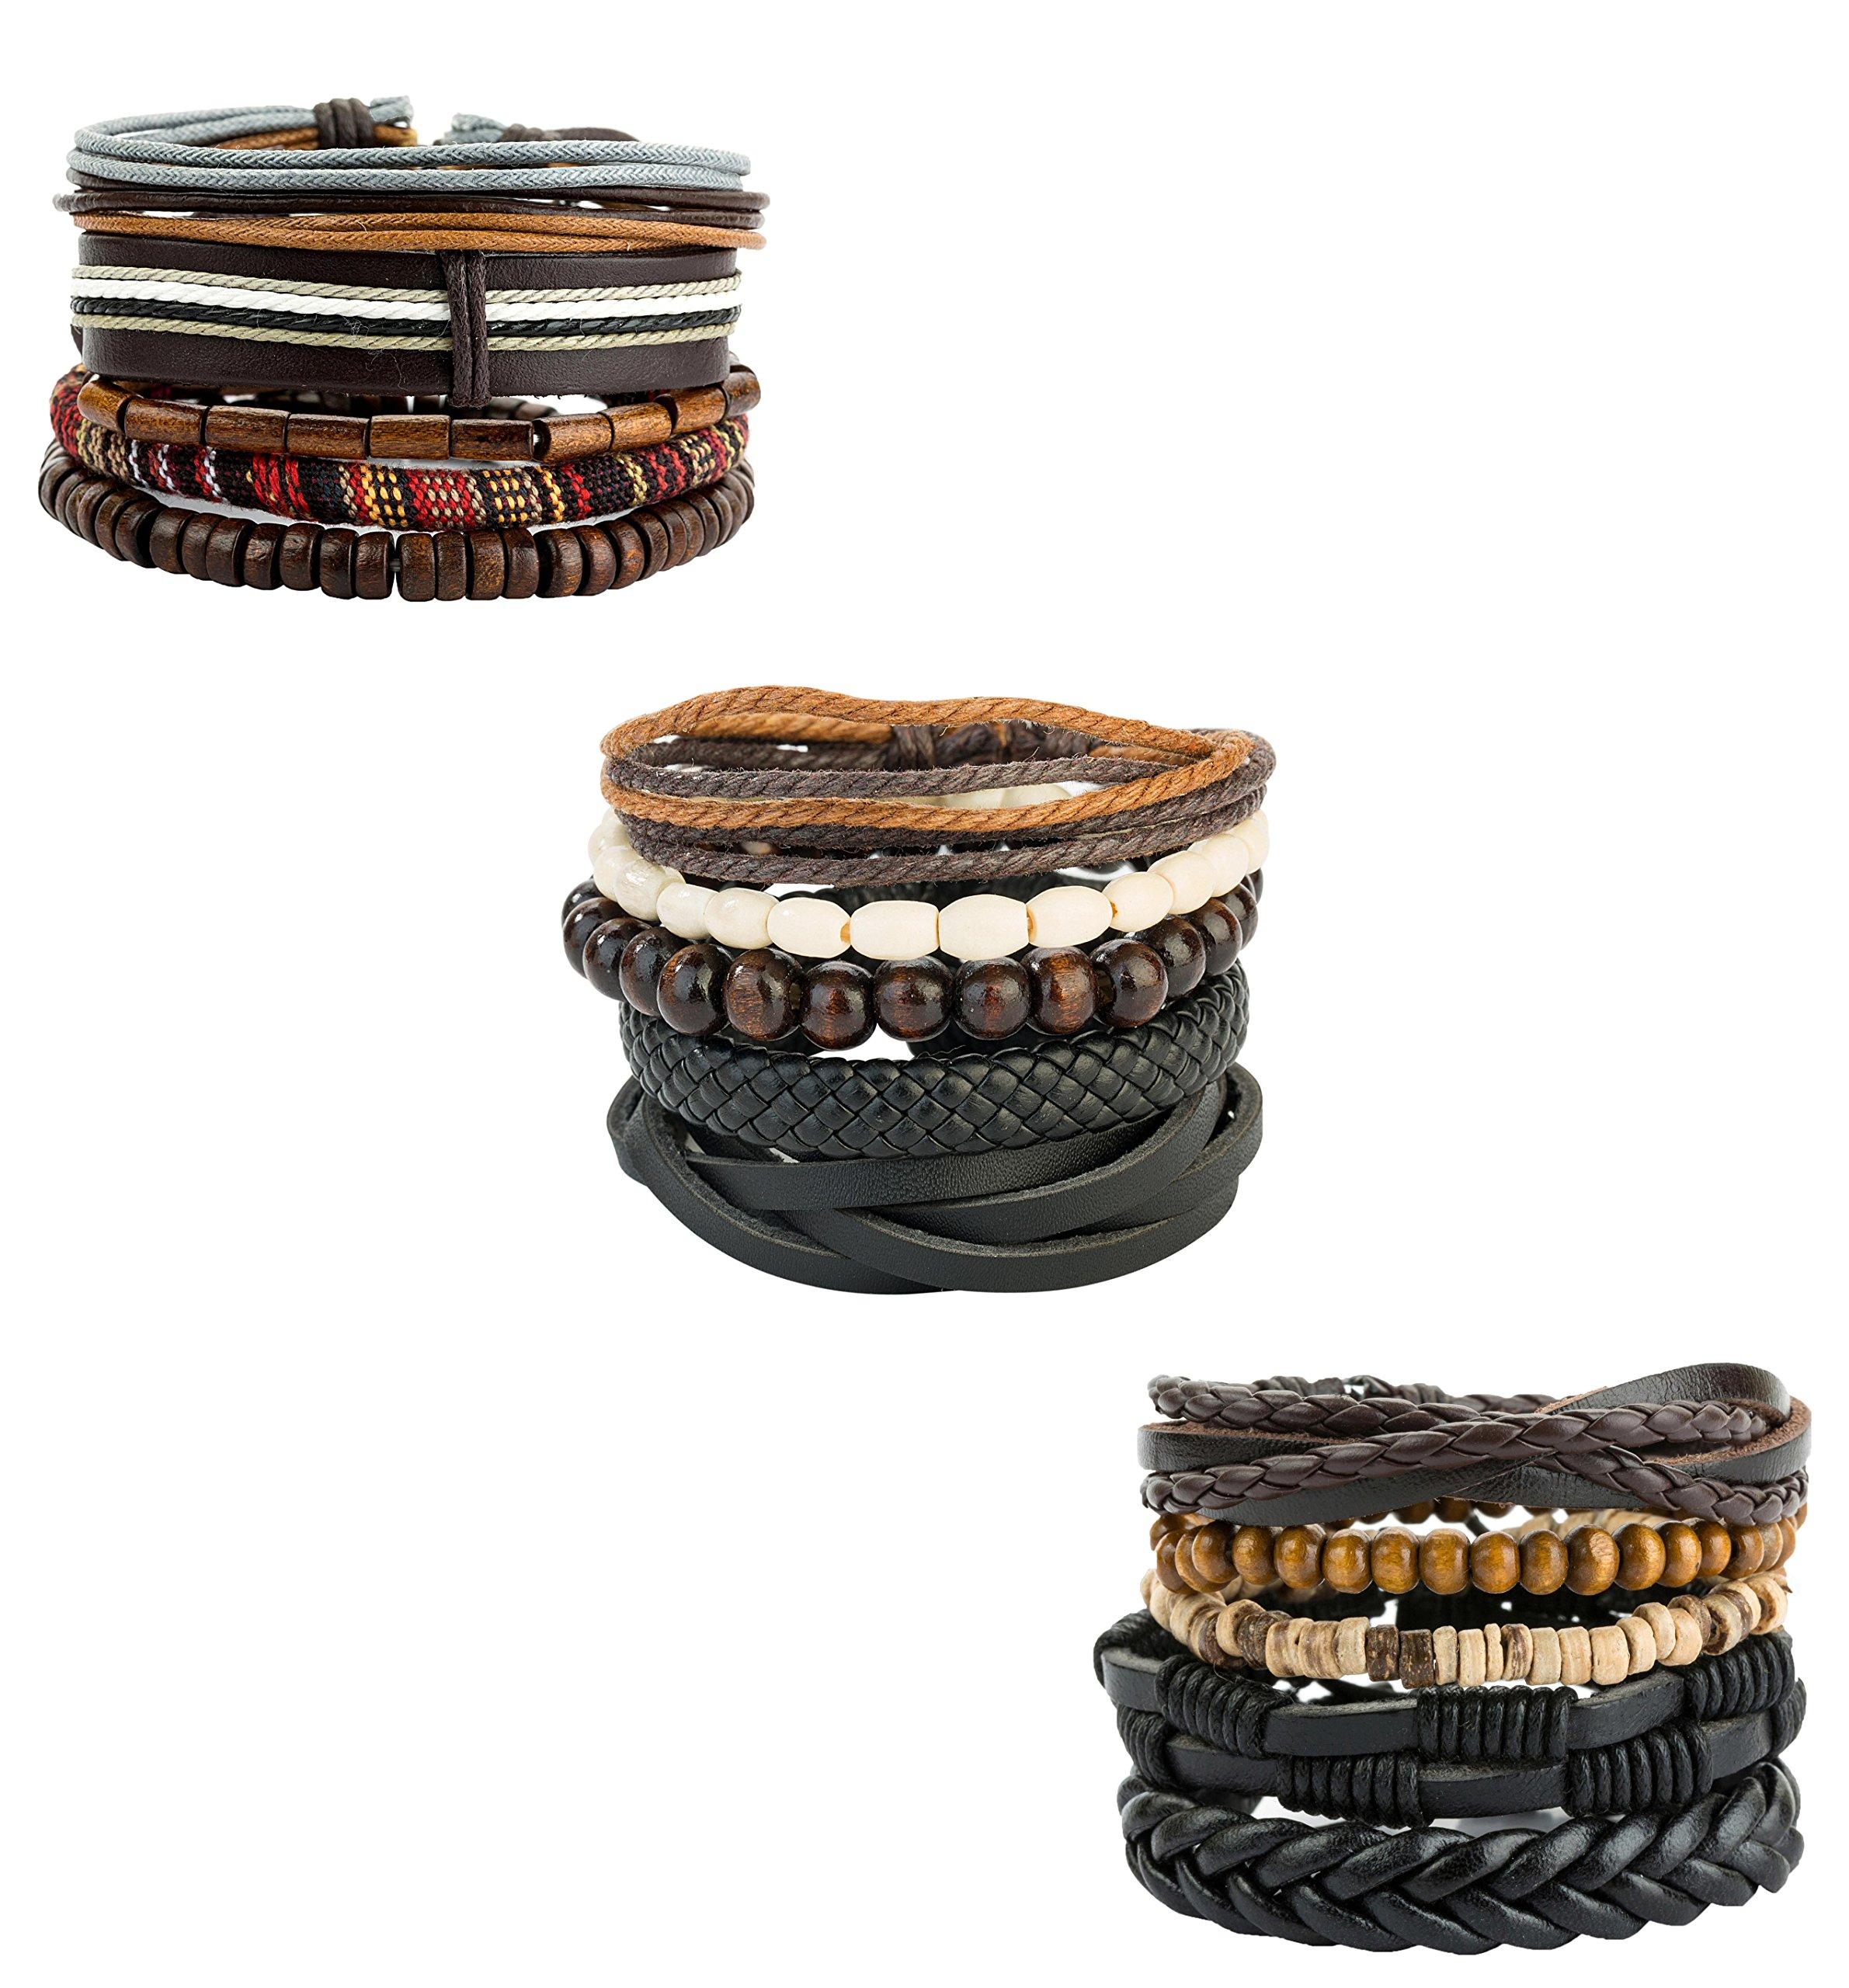 REVOLIA 15Pcs Mens Womens Leather Bracelets Wooden Beaded Bracelets Braided Cuff (B: 15 Pcs Set)